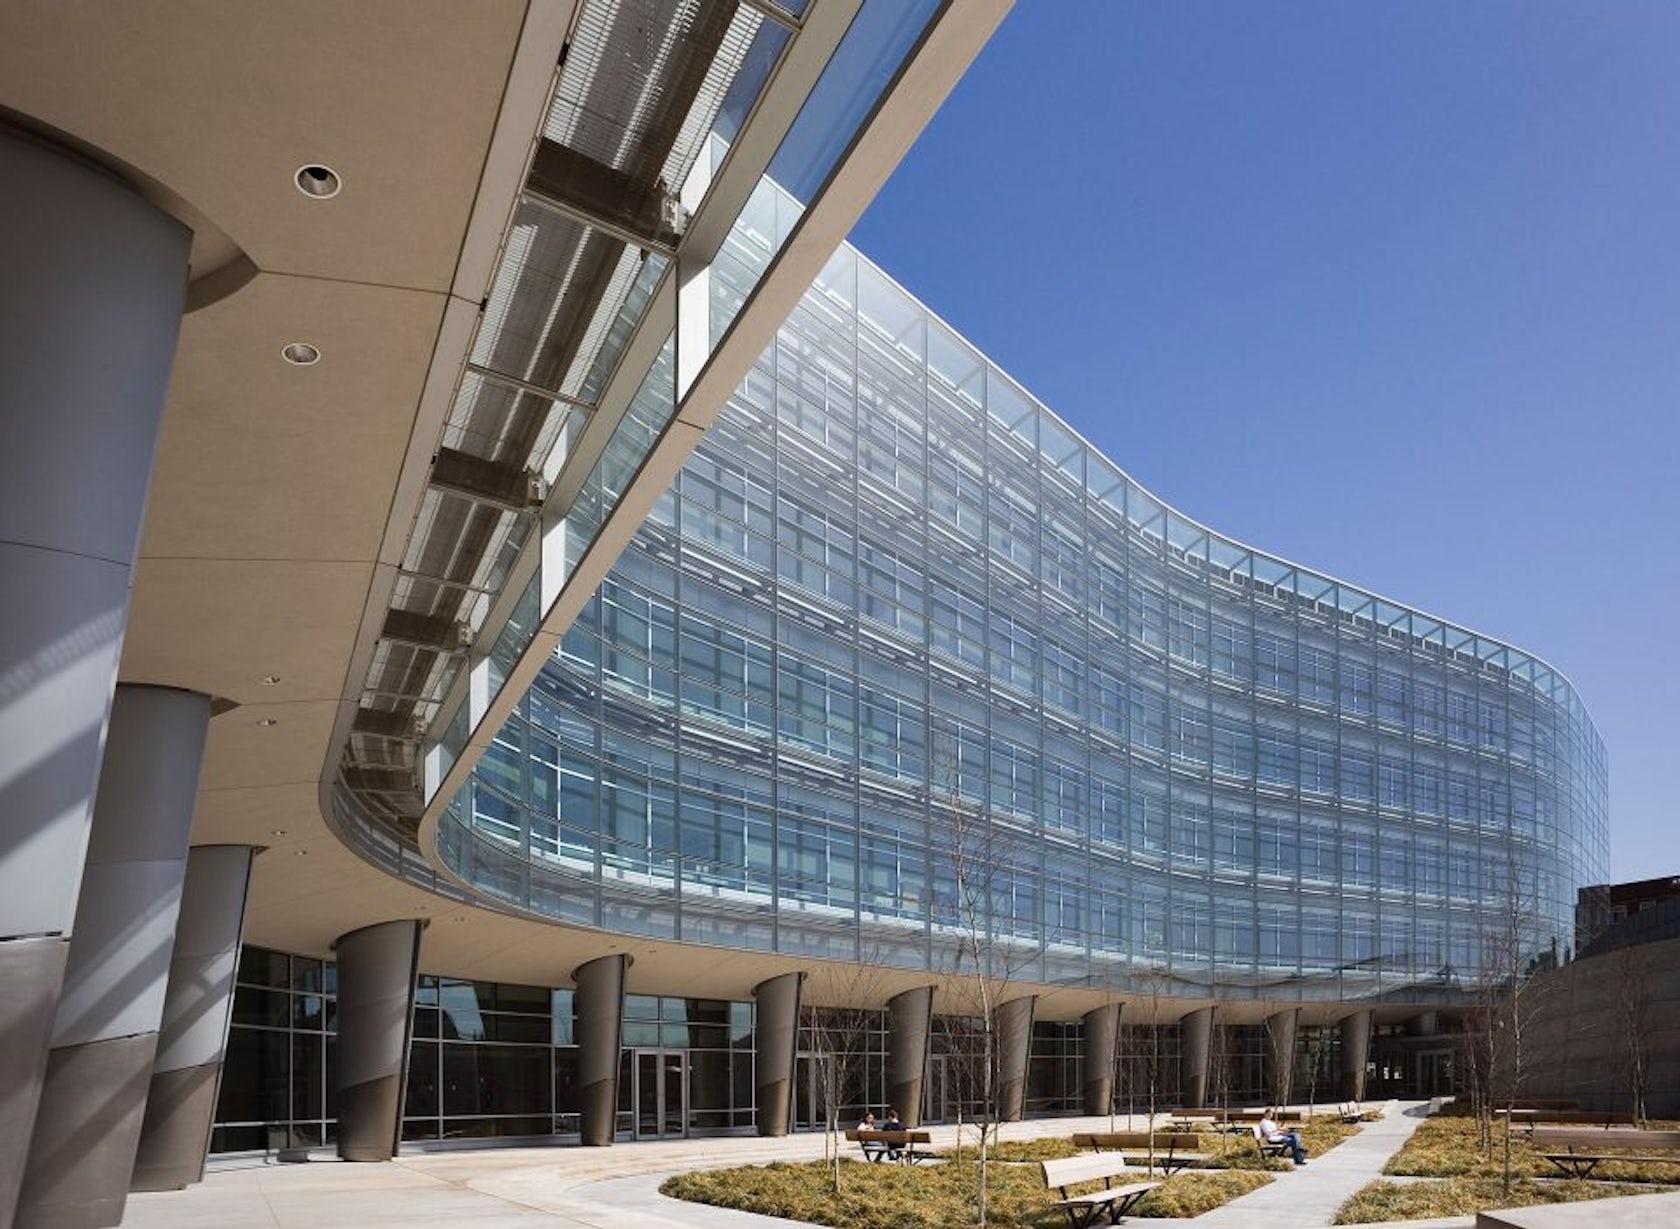 University of Melbourne Arts & Music Student Centre